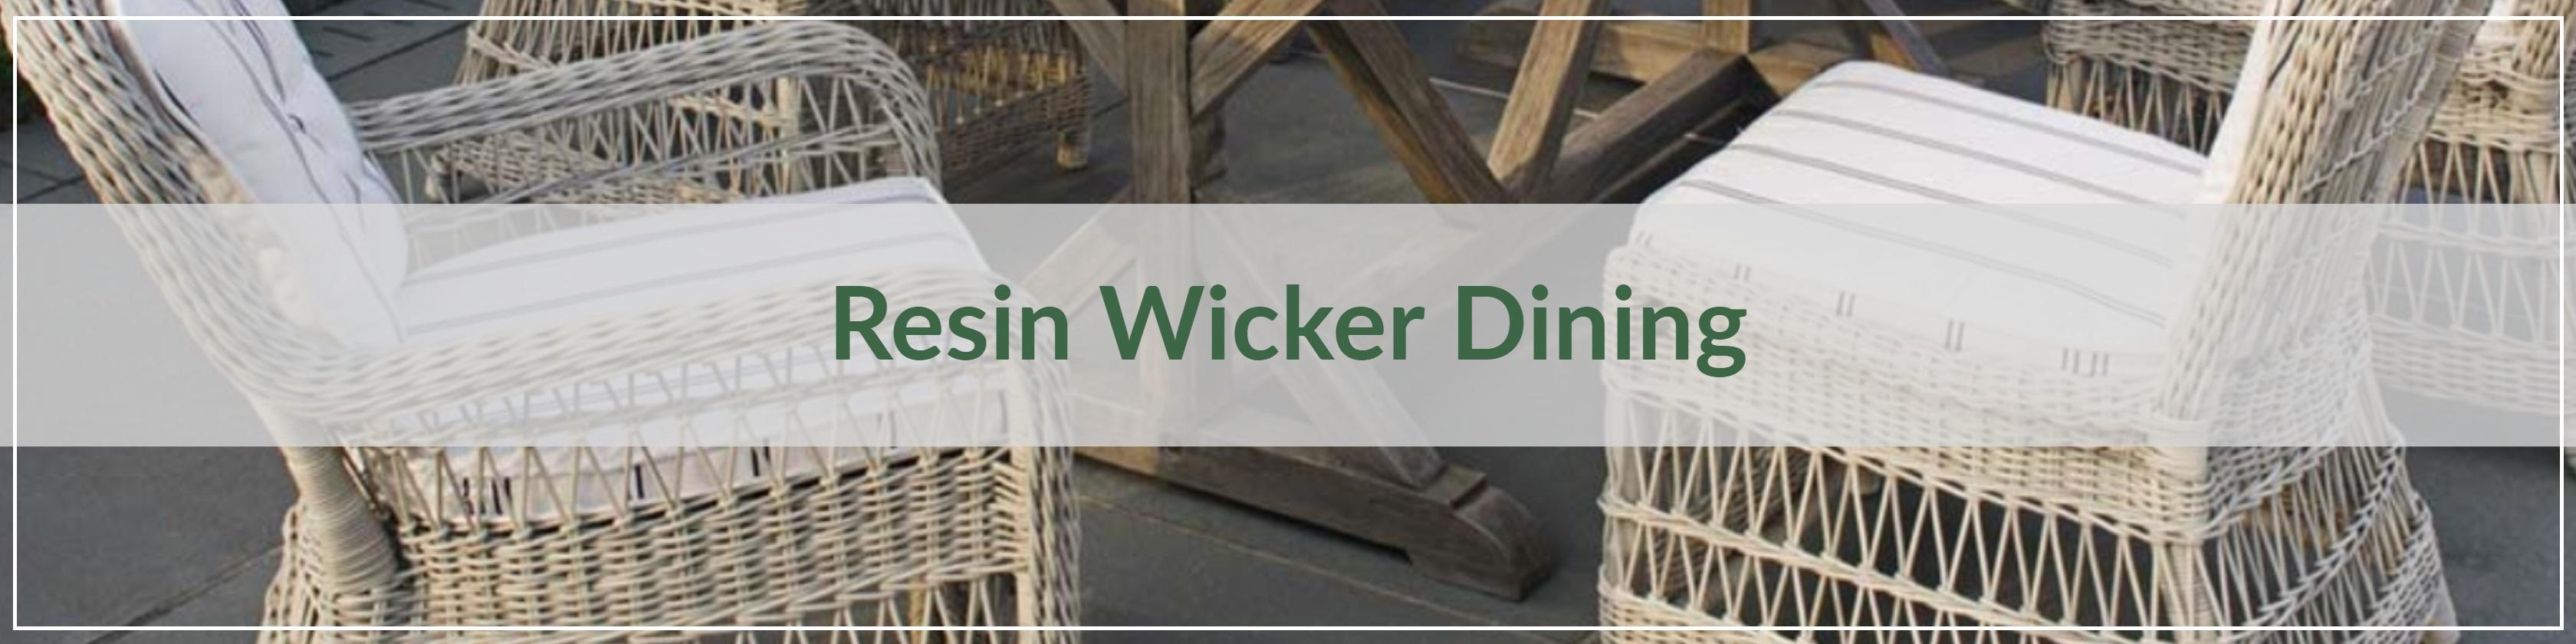 Resin Wicker Dining